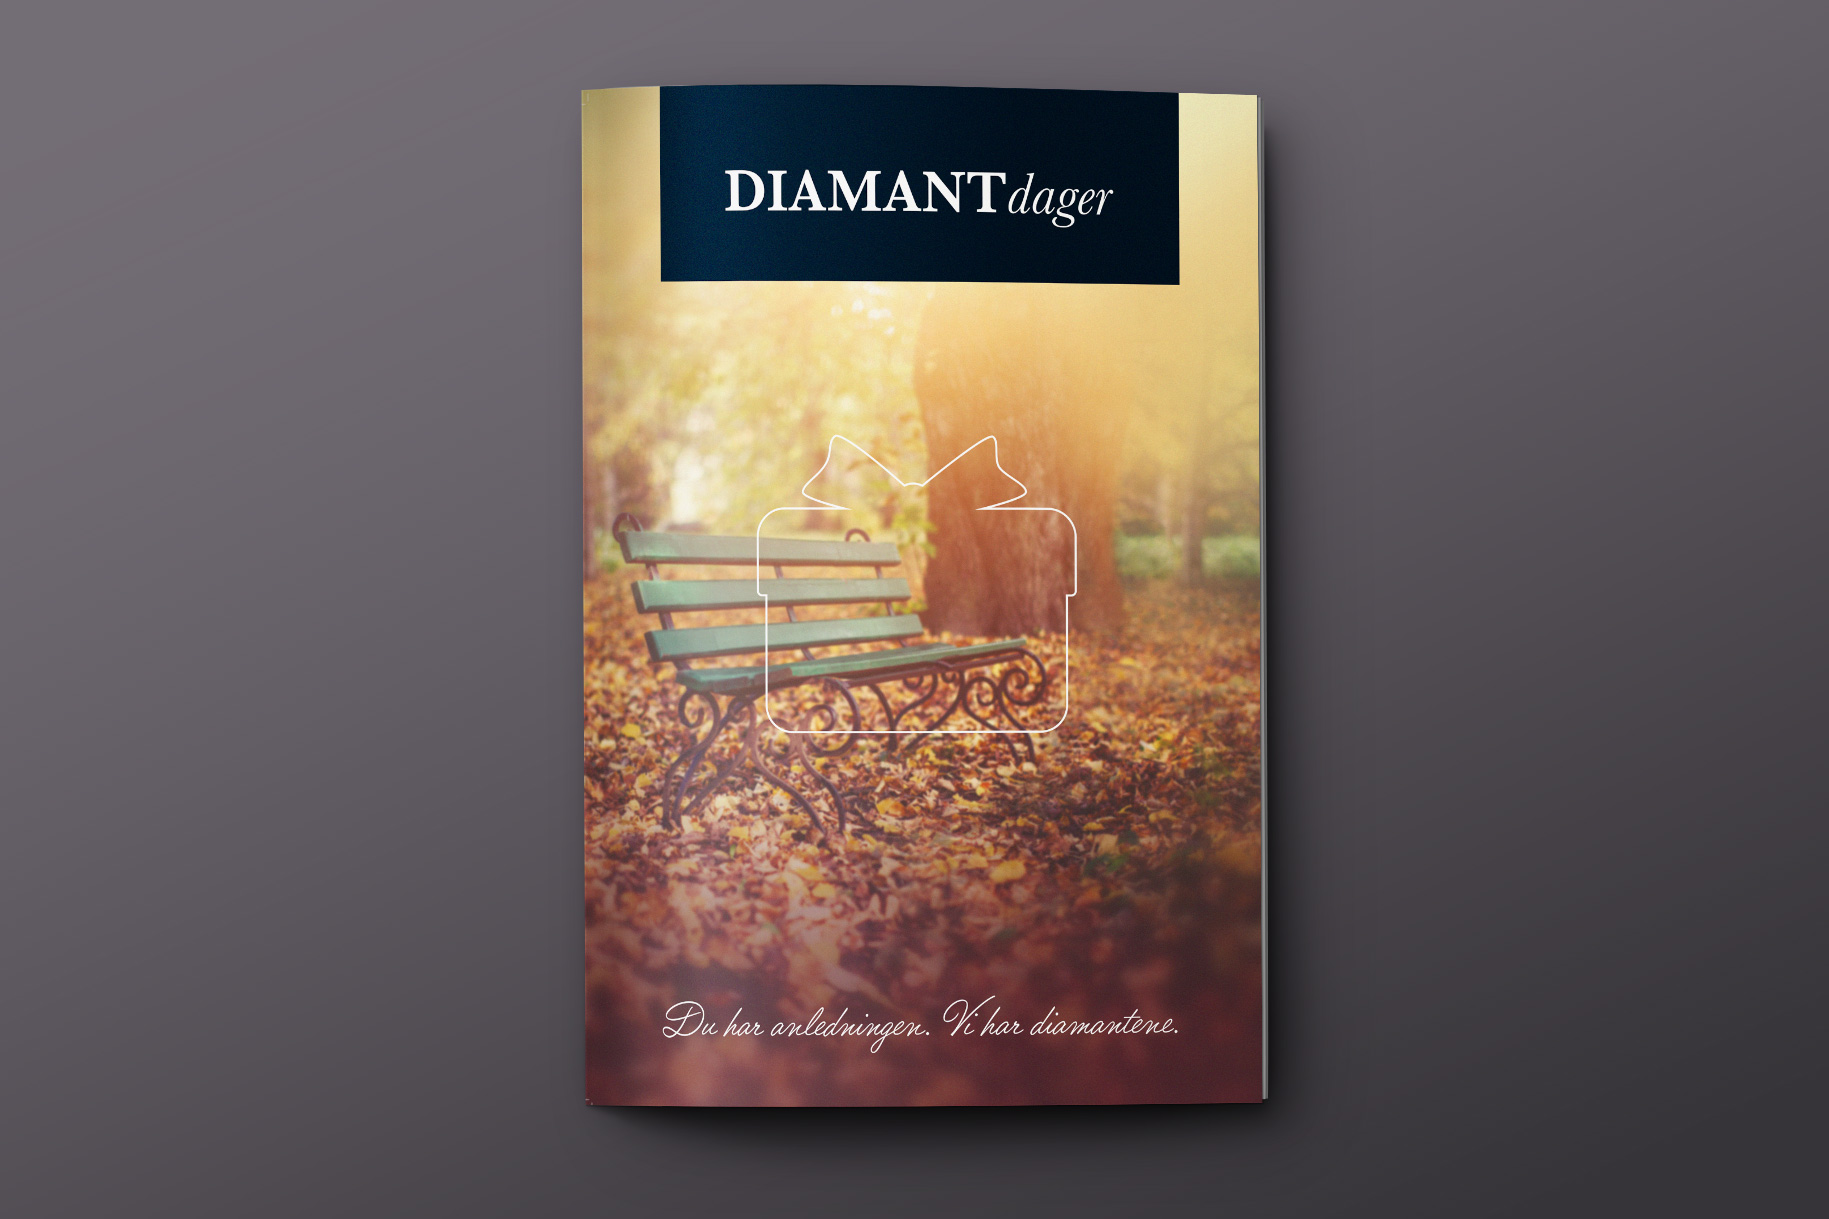 thune_diamantdager01